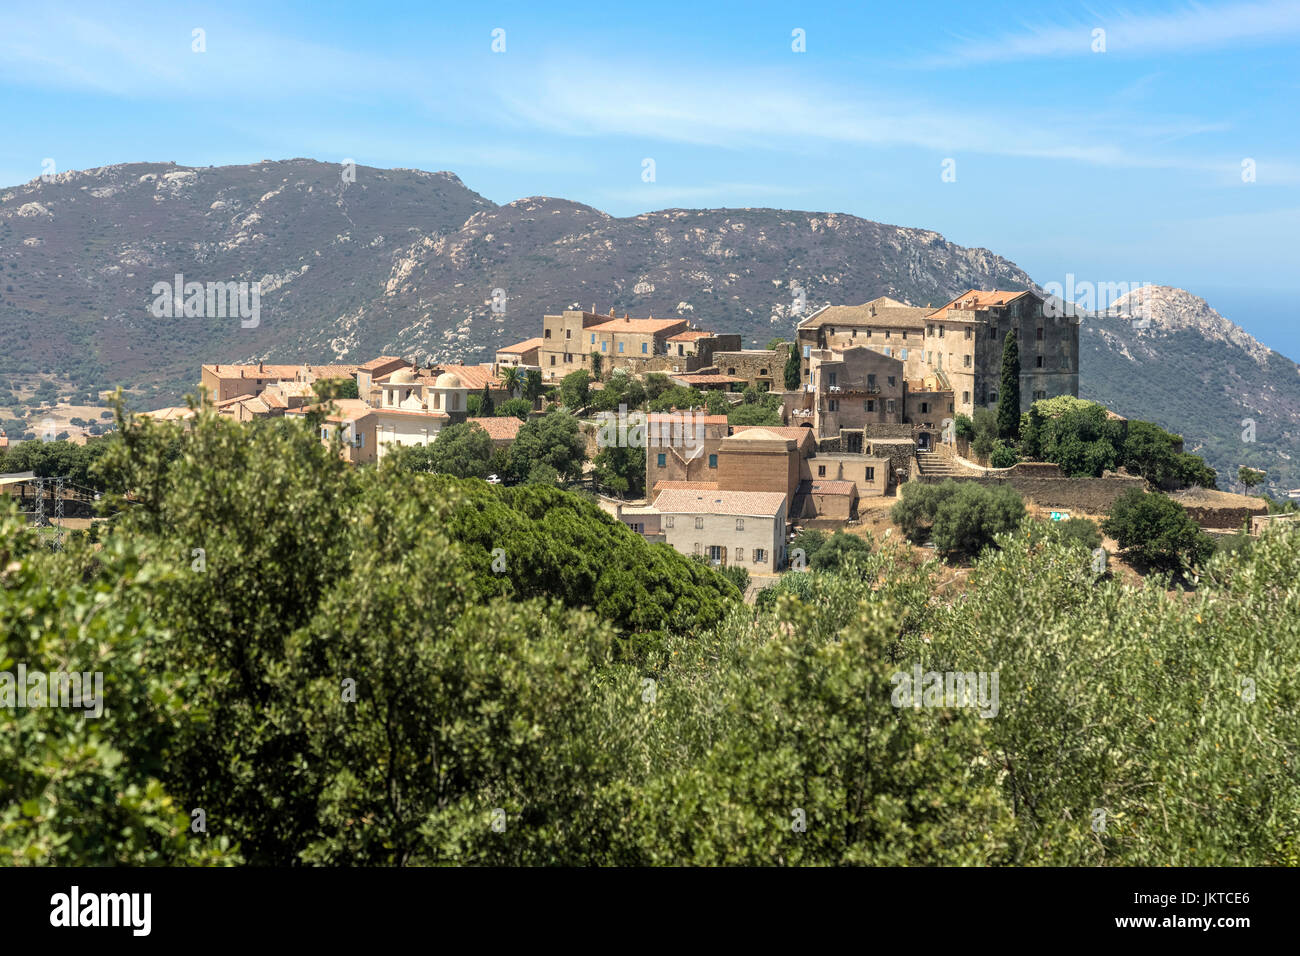 Pigna, Corsica, France - Stock Image